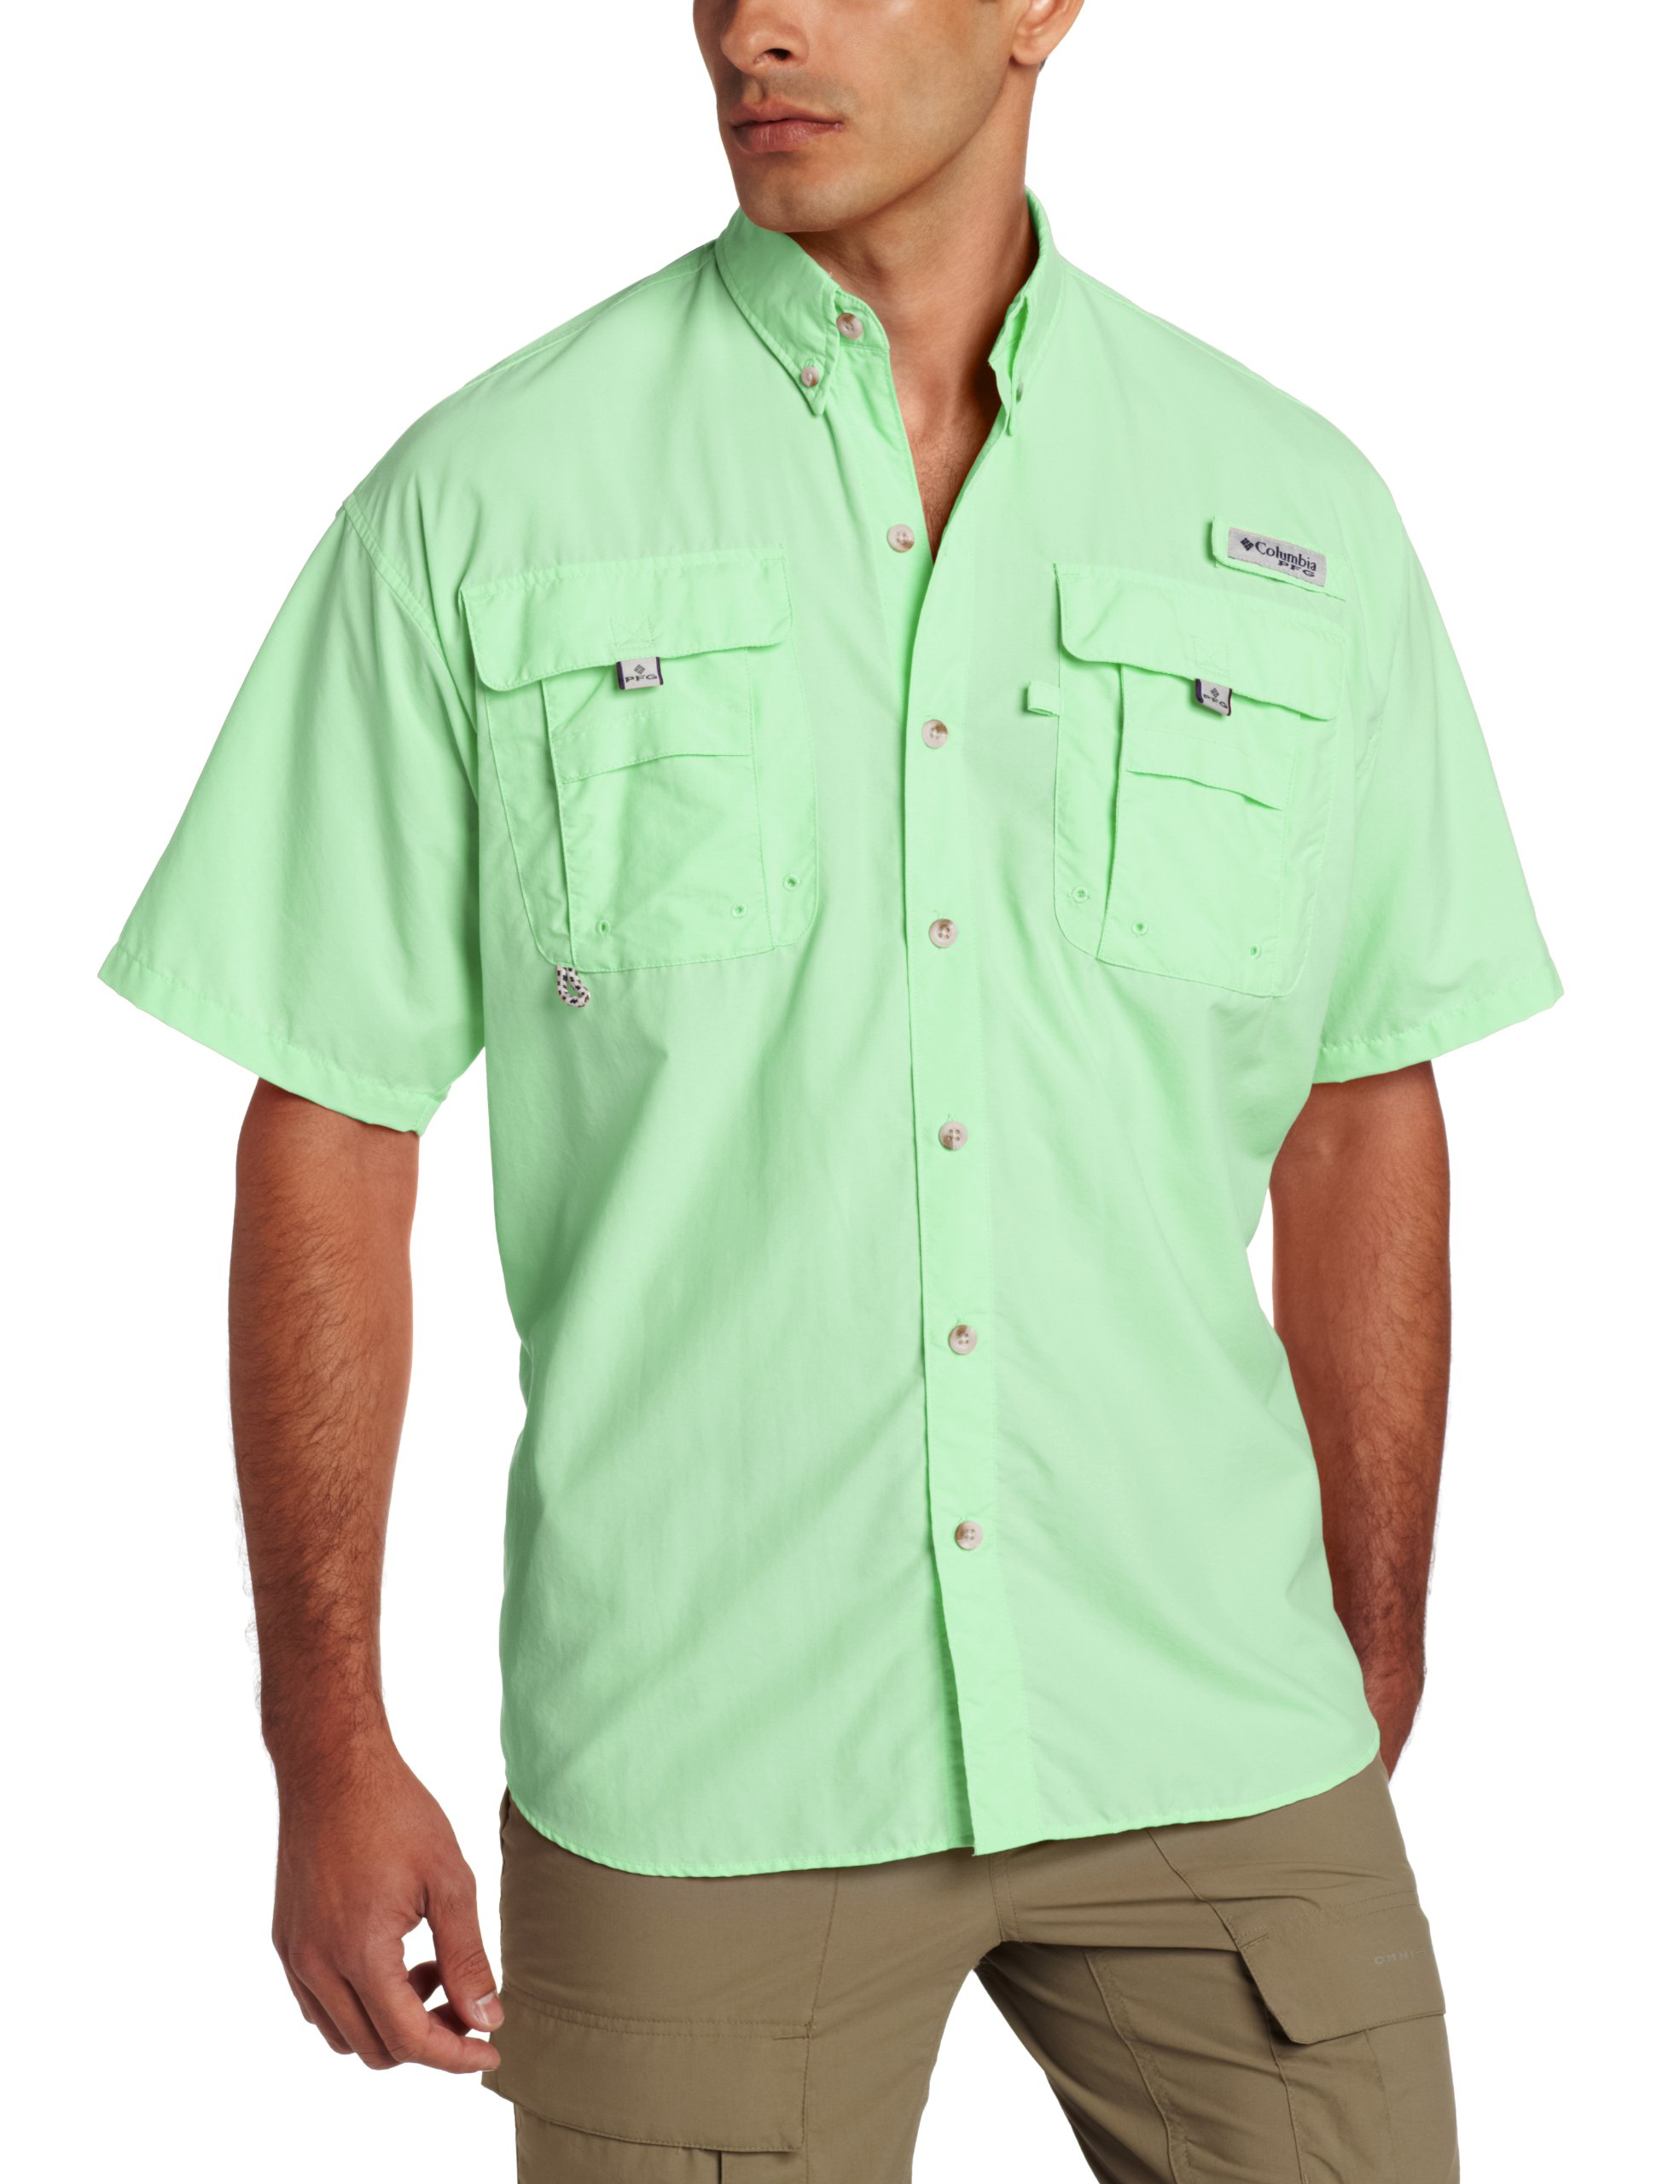 Columbia Men's PFG Bahama II Short Sleeve Shirt, Key West, Medium